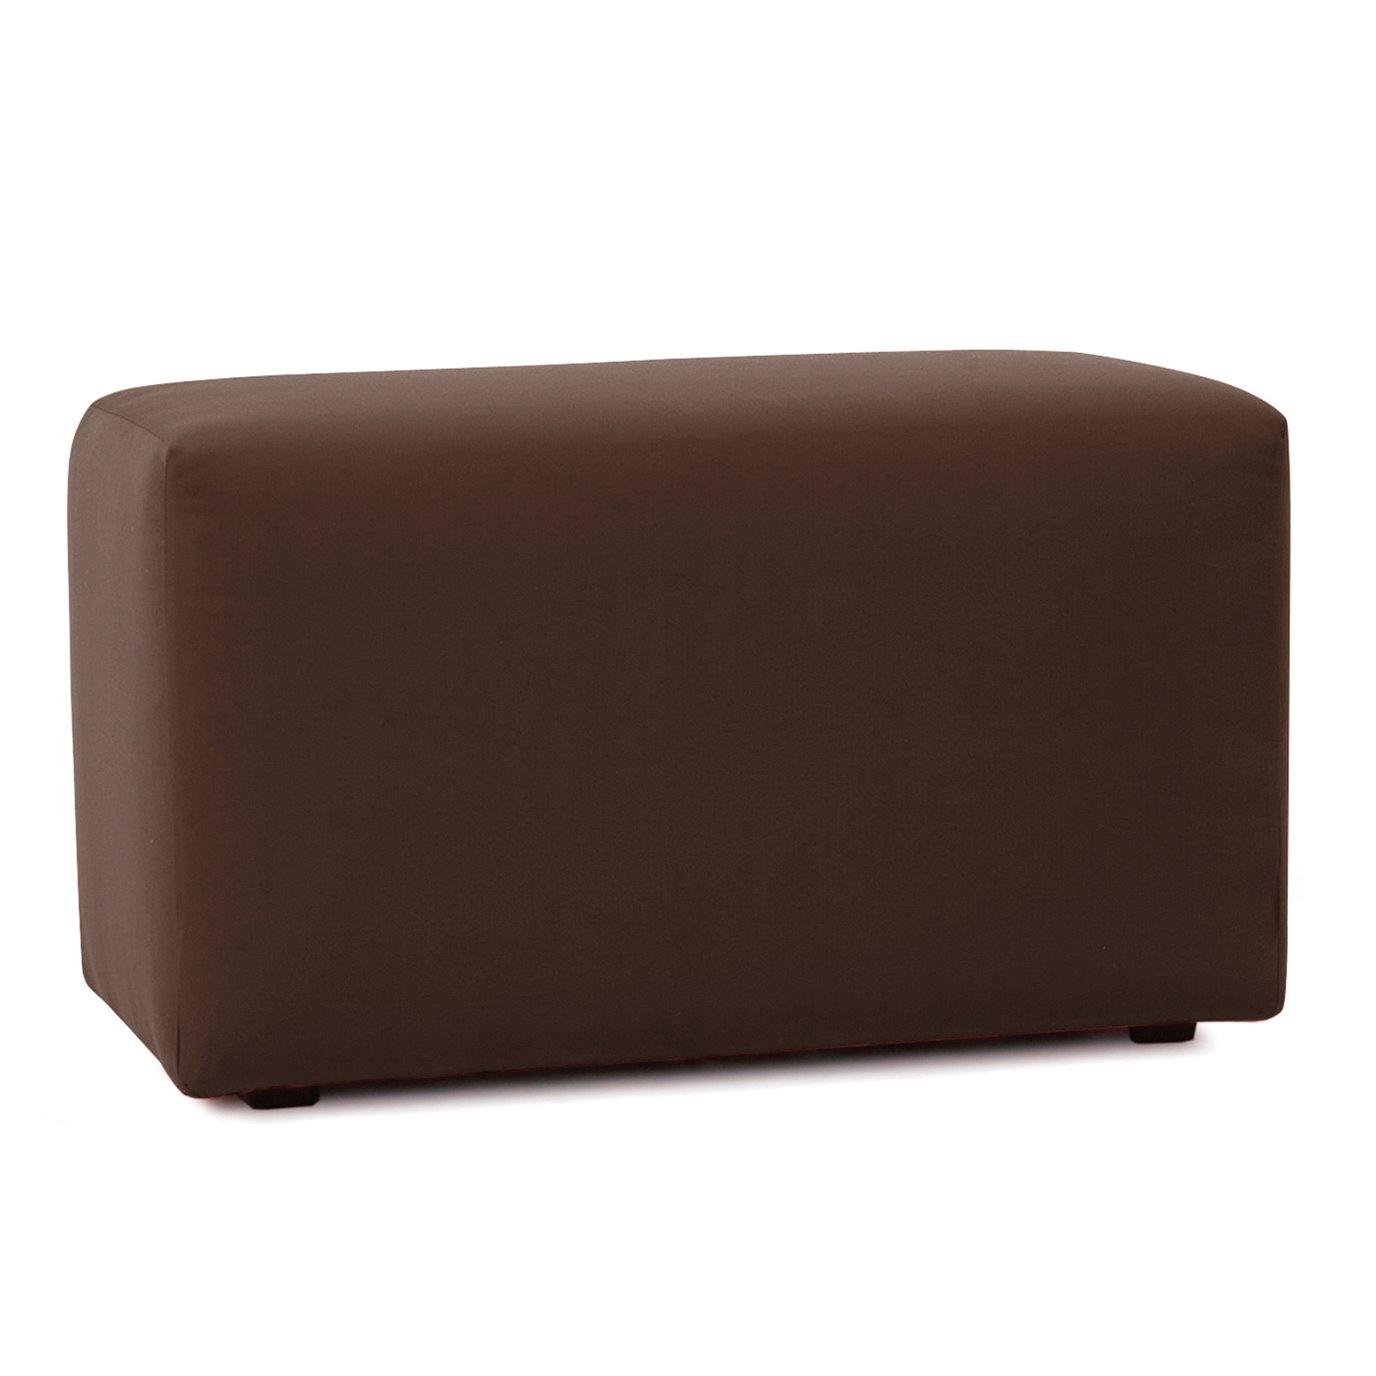 Howard Elliott Universal Bench Outdoor Sunbrella Seascape Chocolate Complete Ottoman